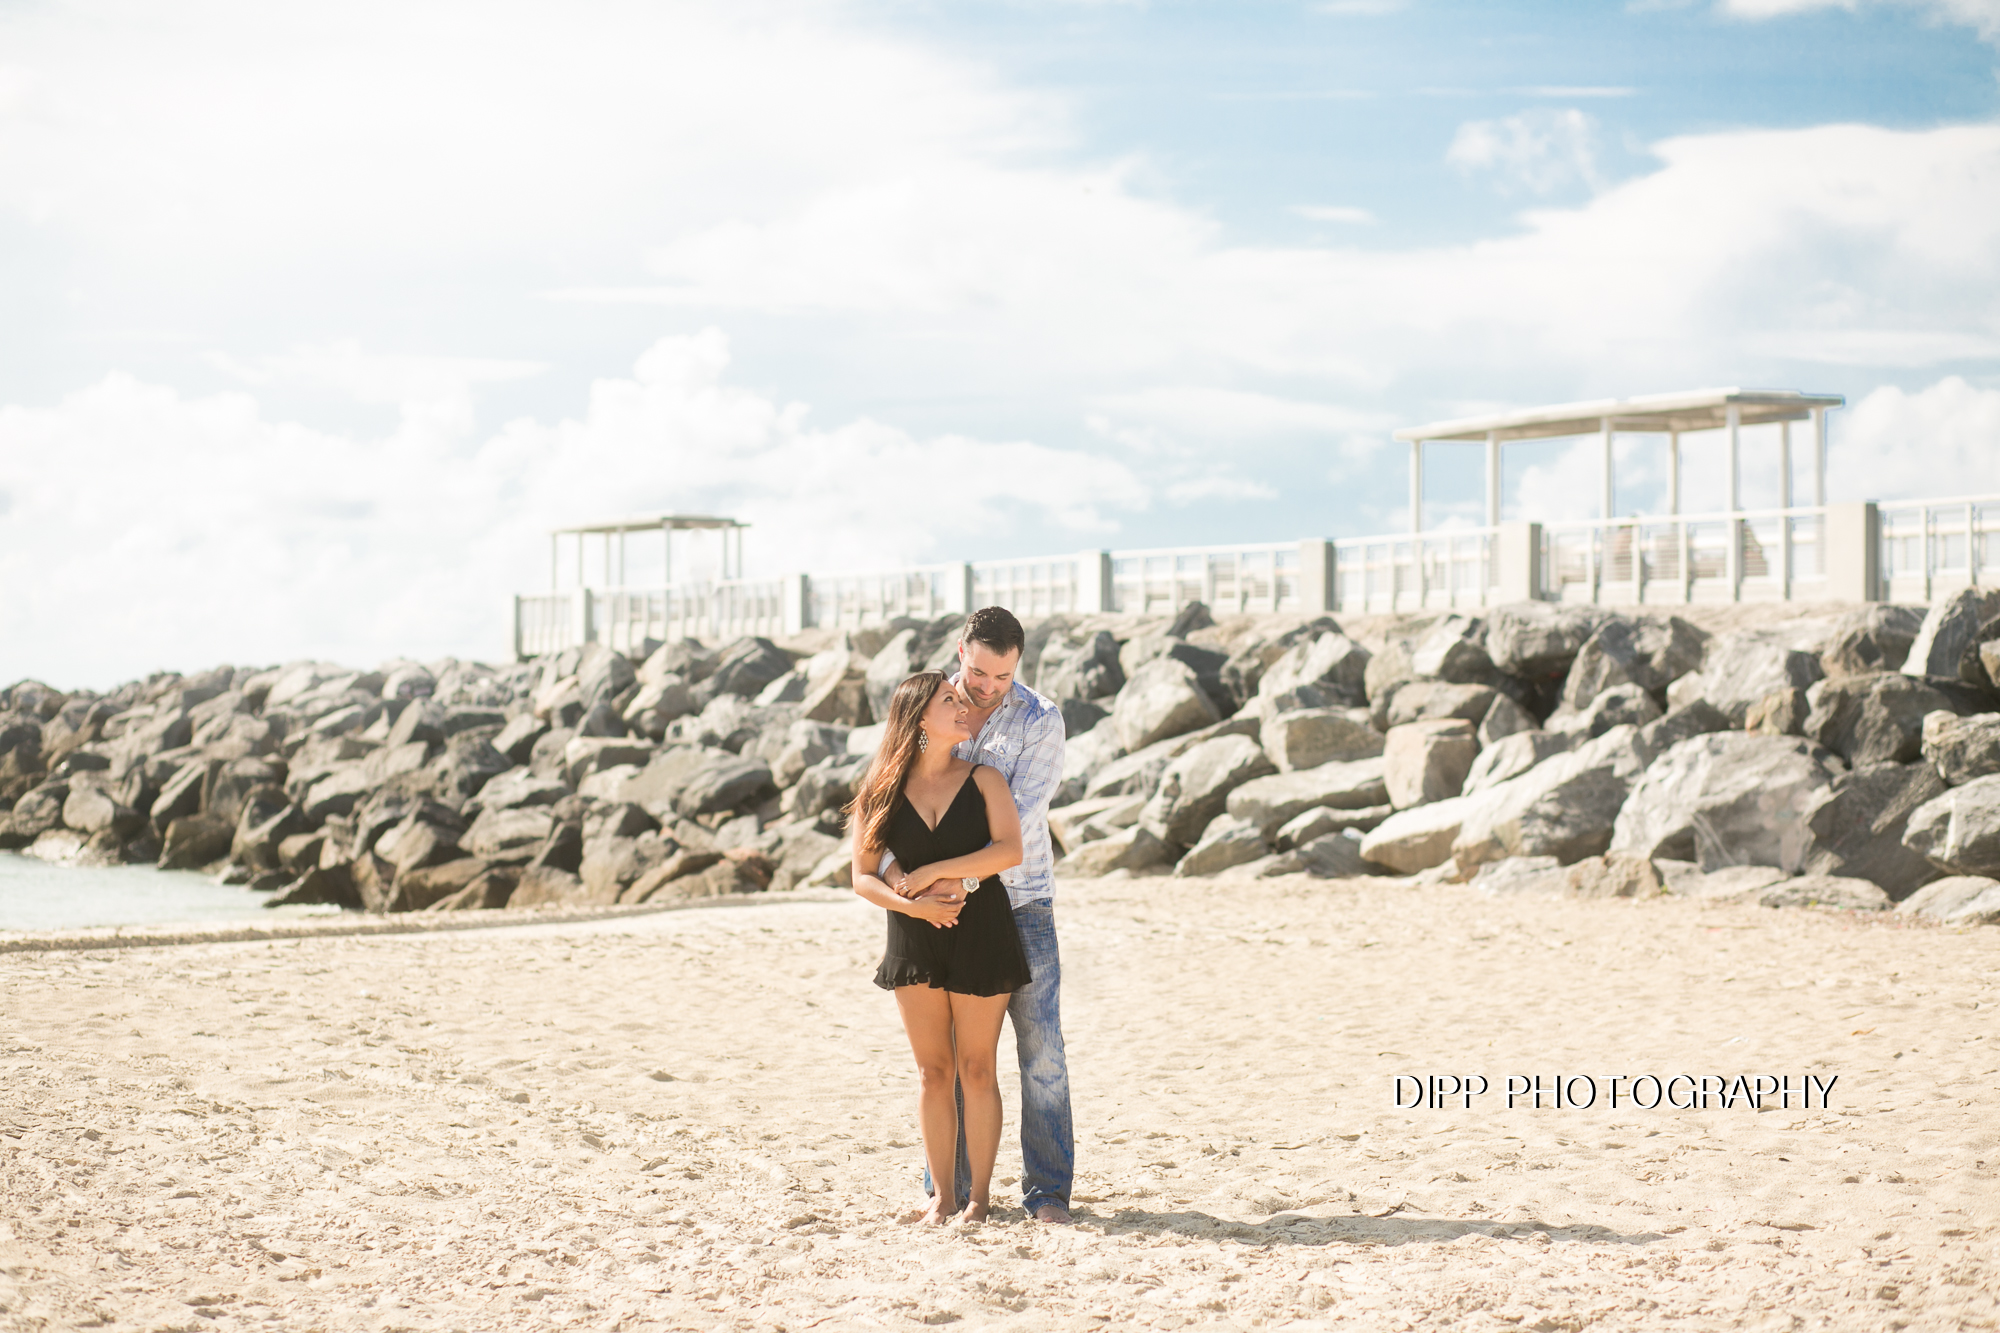 Dipp_2016 Brandon & Sara Mini Engagement Session-95-Edit